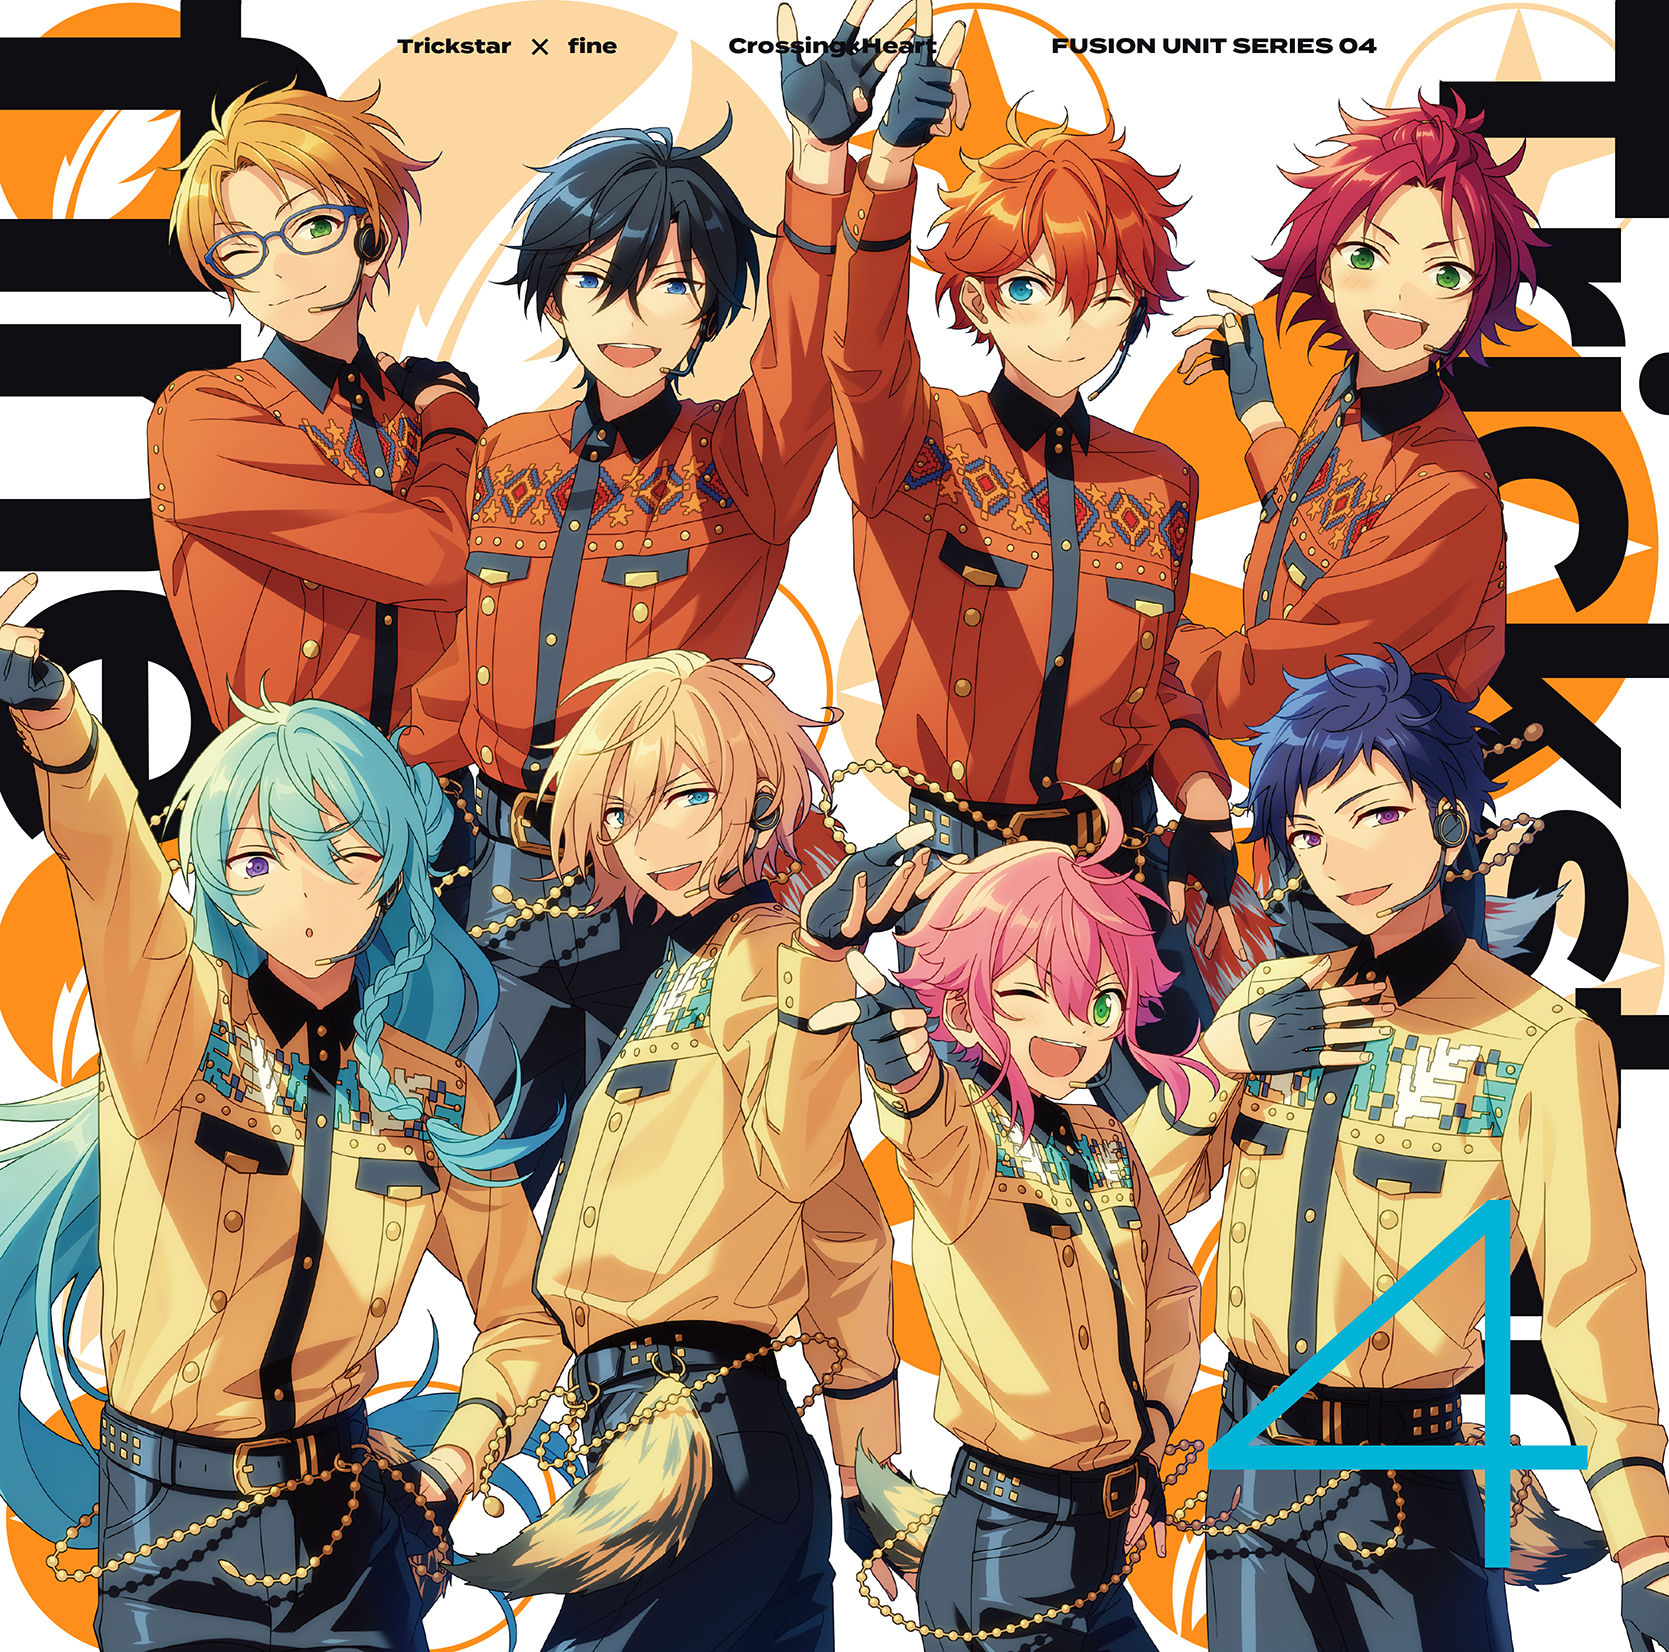 Trickstar × fineはもはや「あんスタ」の概念!「FUSION UNIT SONG」第4弾発売決定